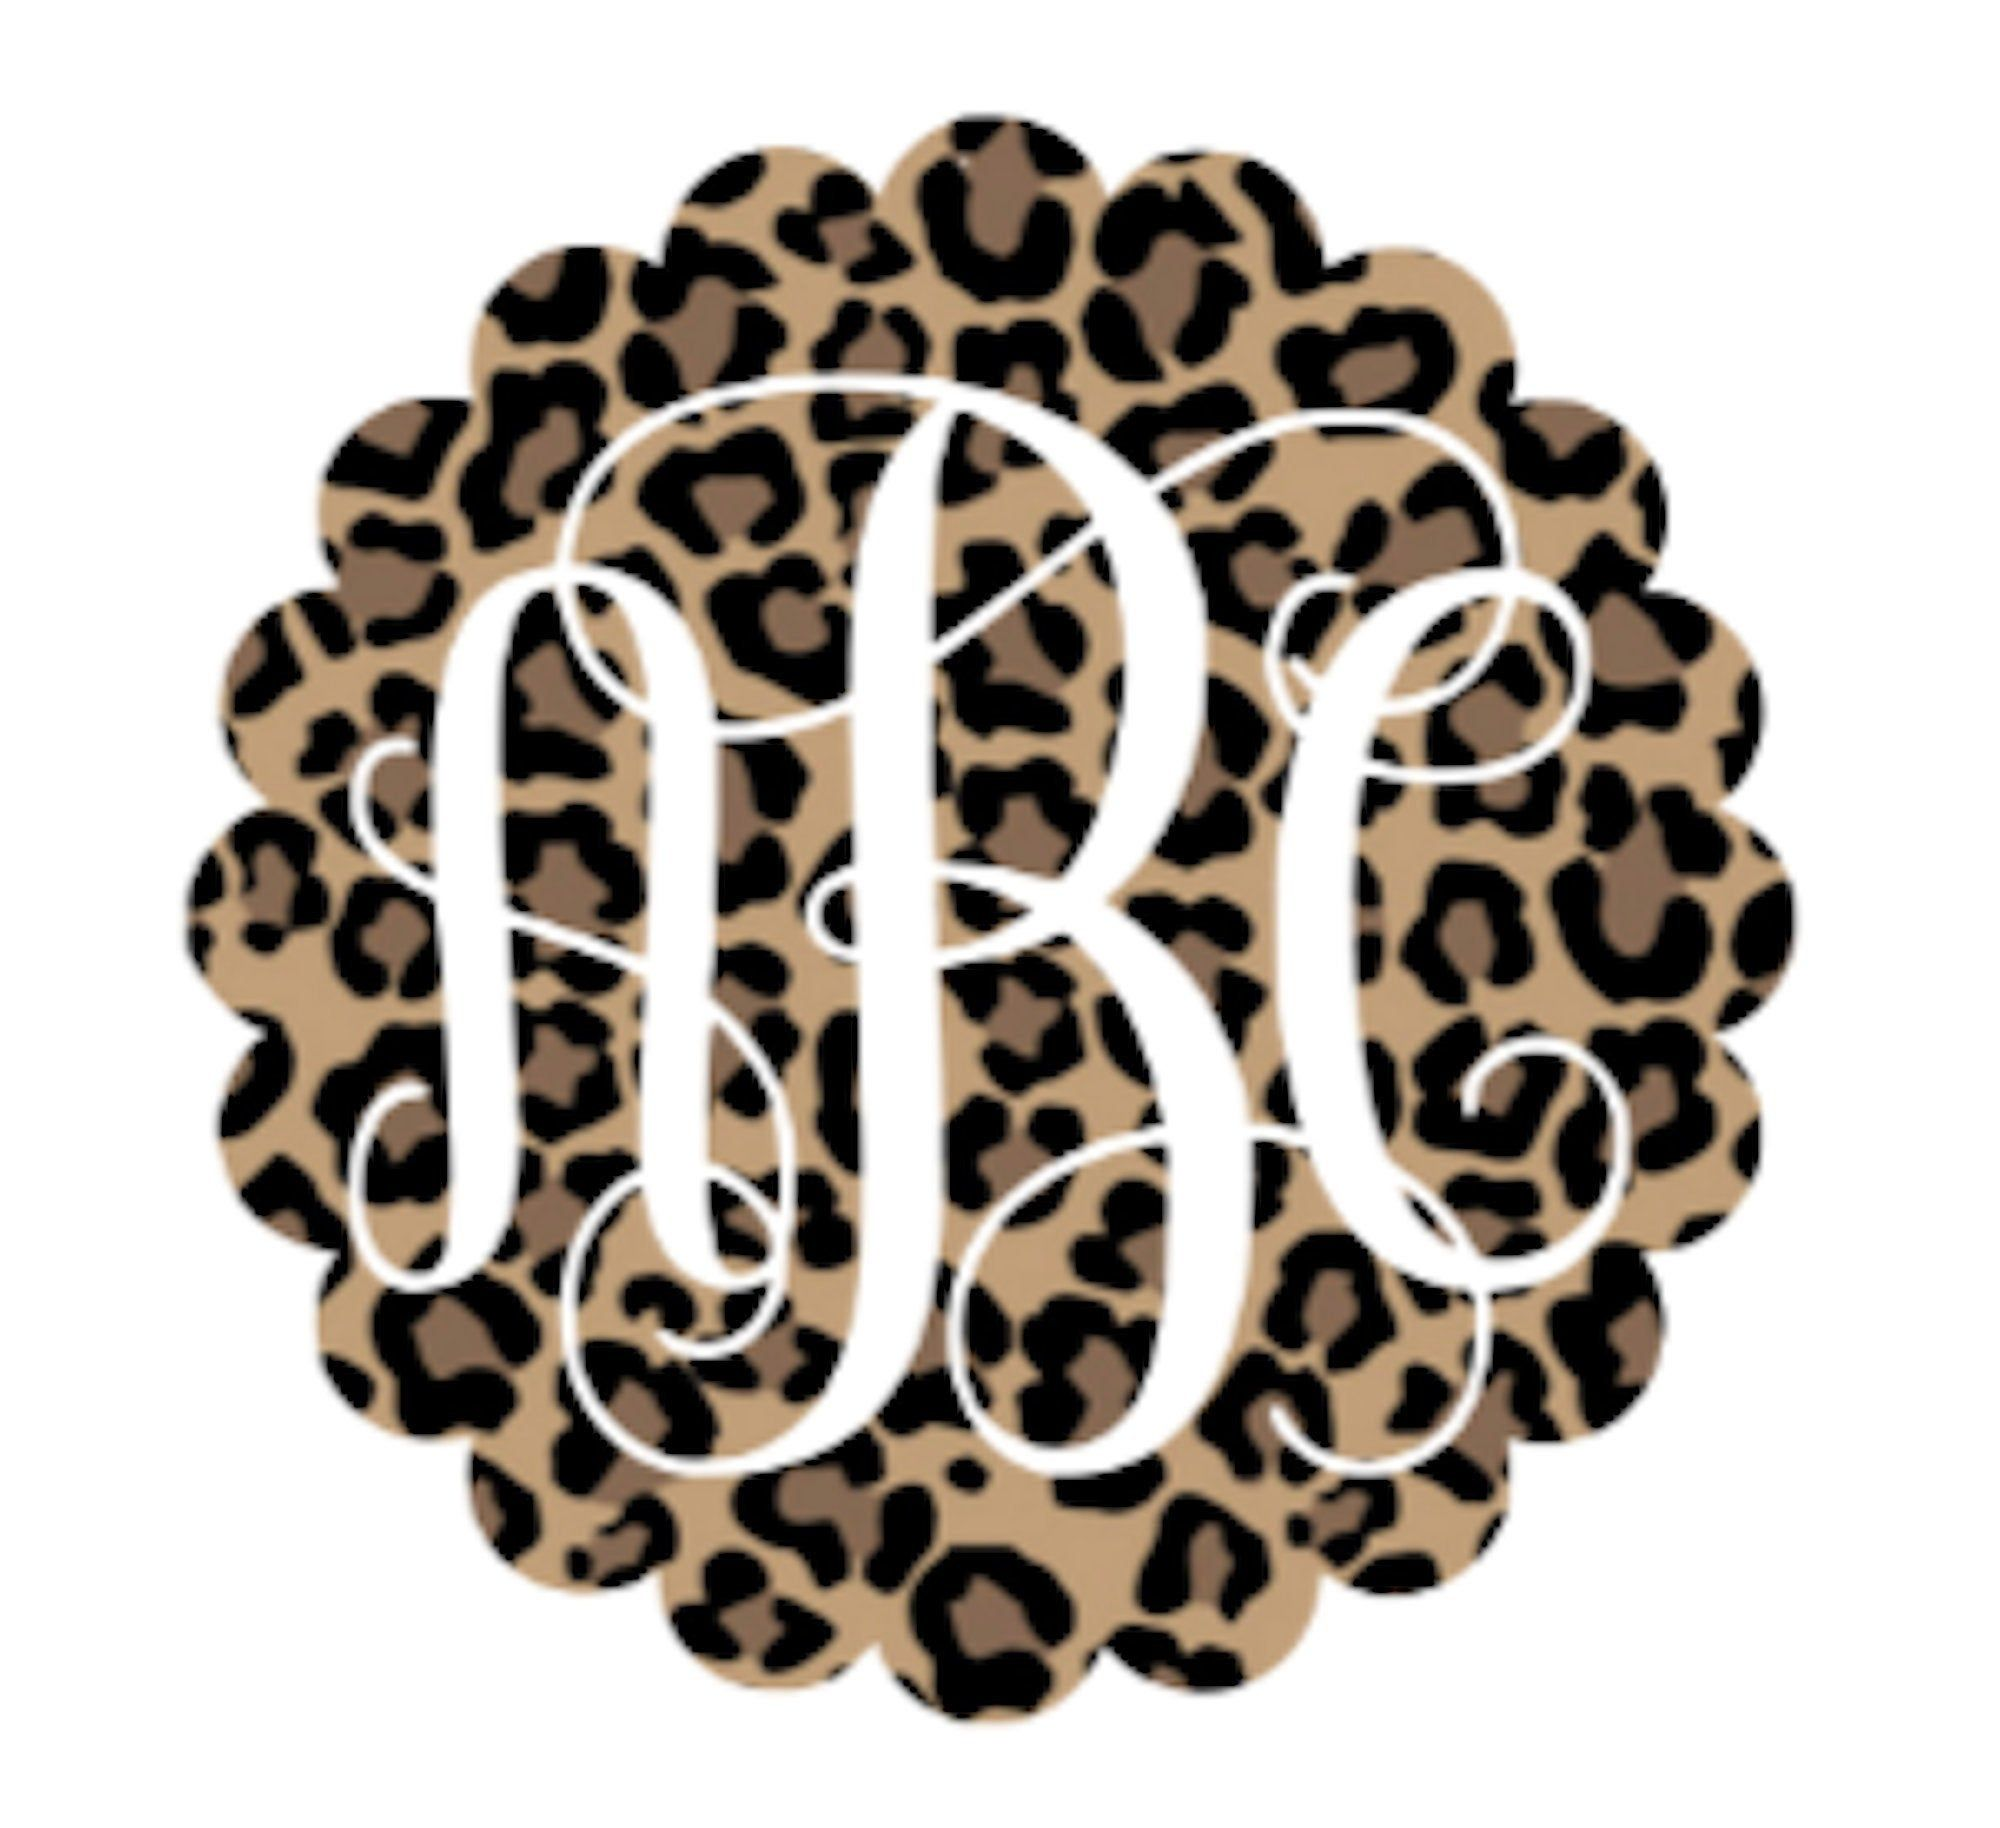 Leopard Monogram Leopard Print Cup Decal Tumbler Decal Car Decal Decal For Women Wonderfully Made Creations Car Monogram Monogram Car Stickers Monogram Vinyl Decal [ 1828 x 2000 Pixel ]